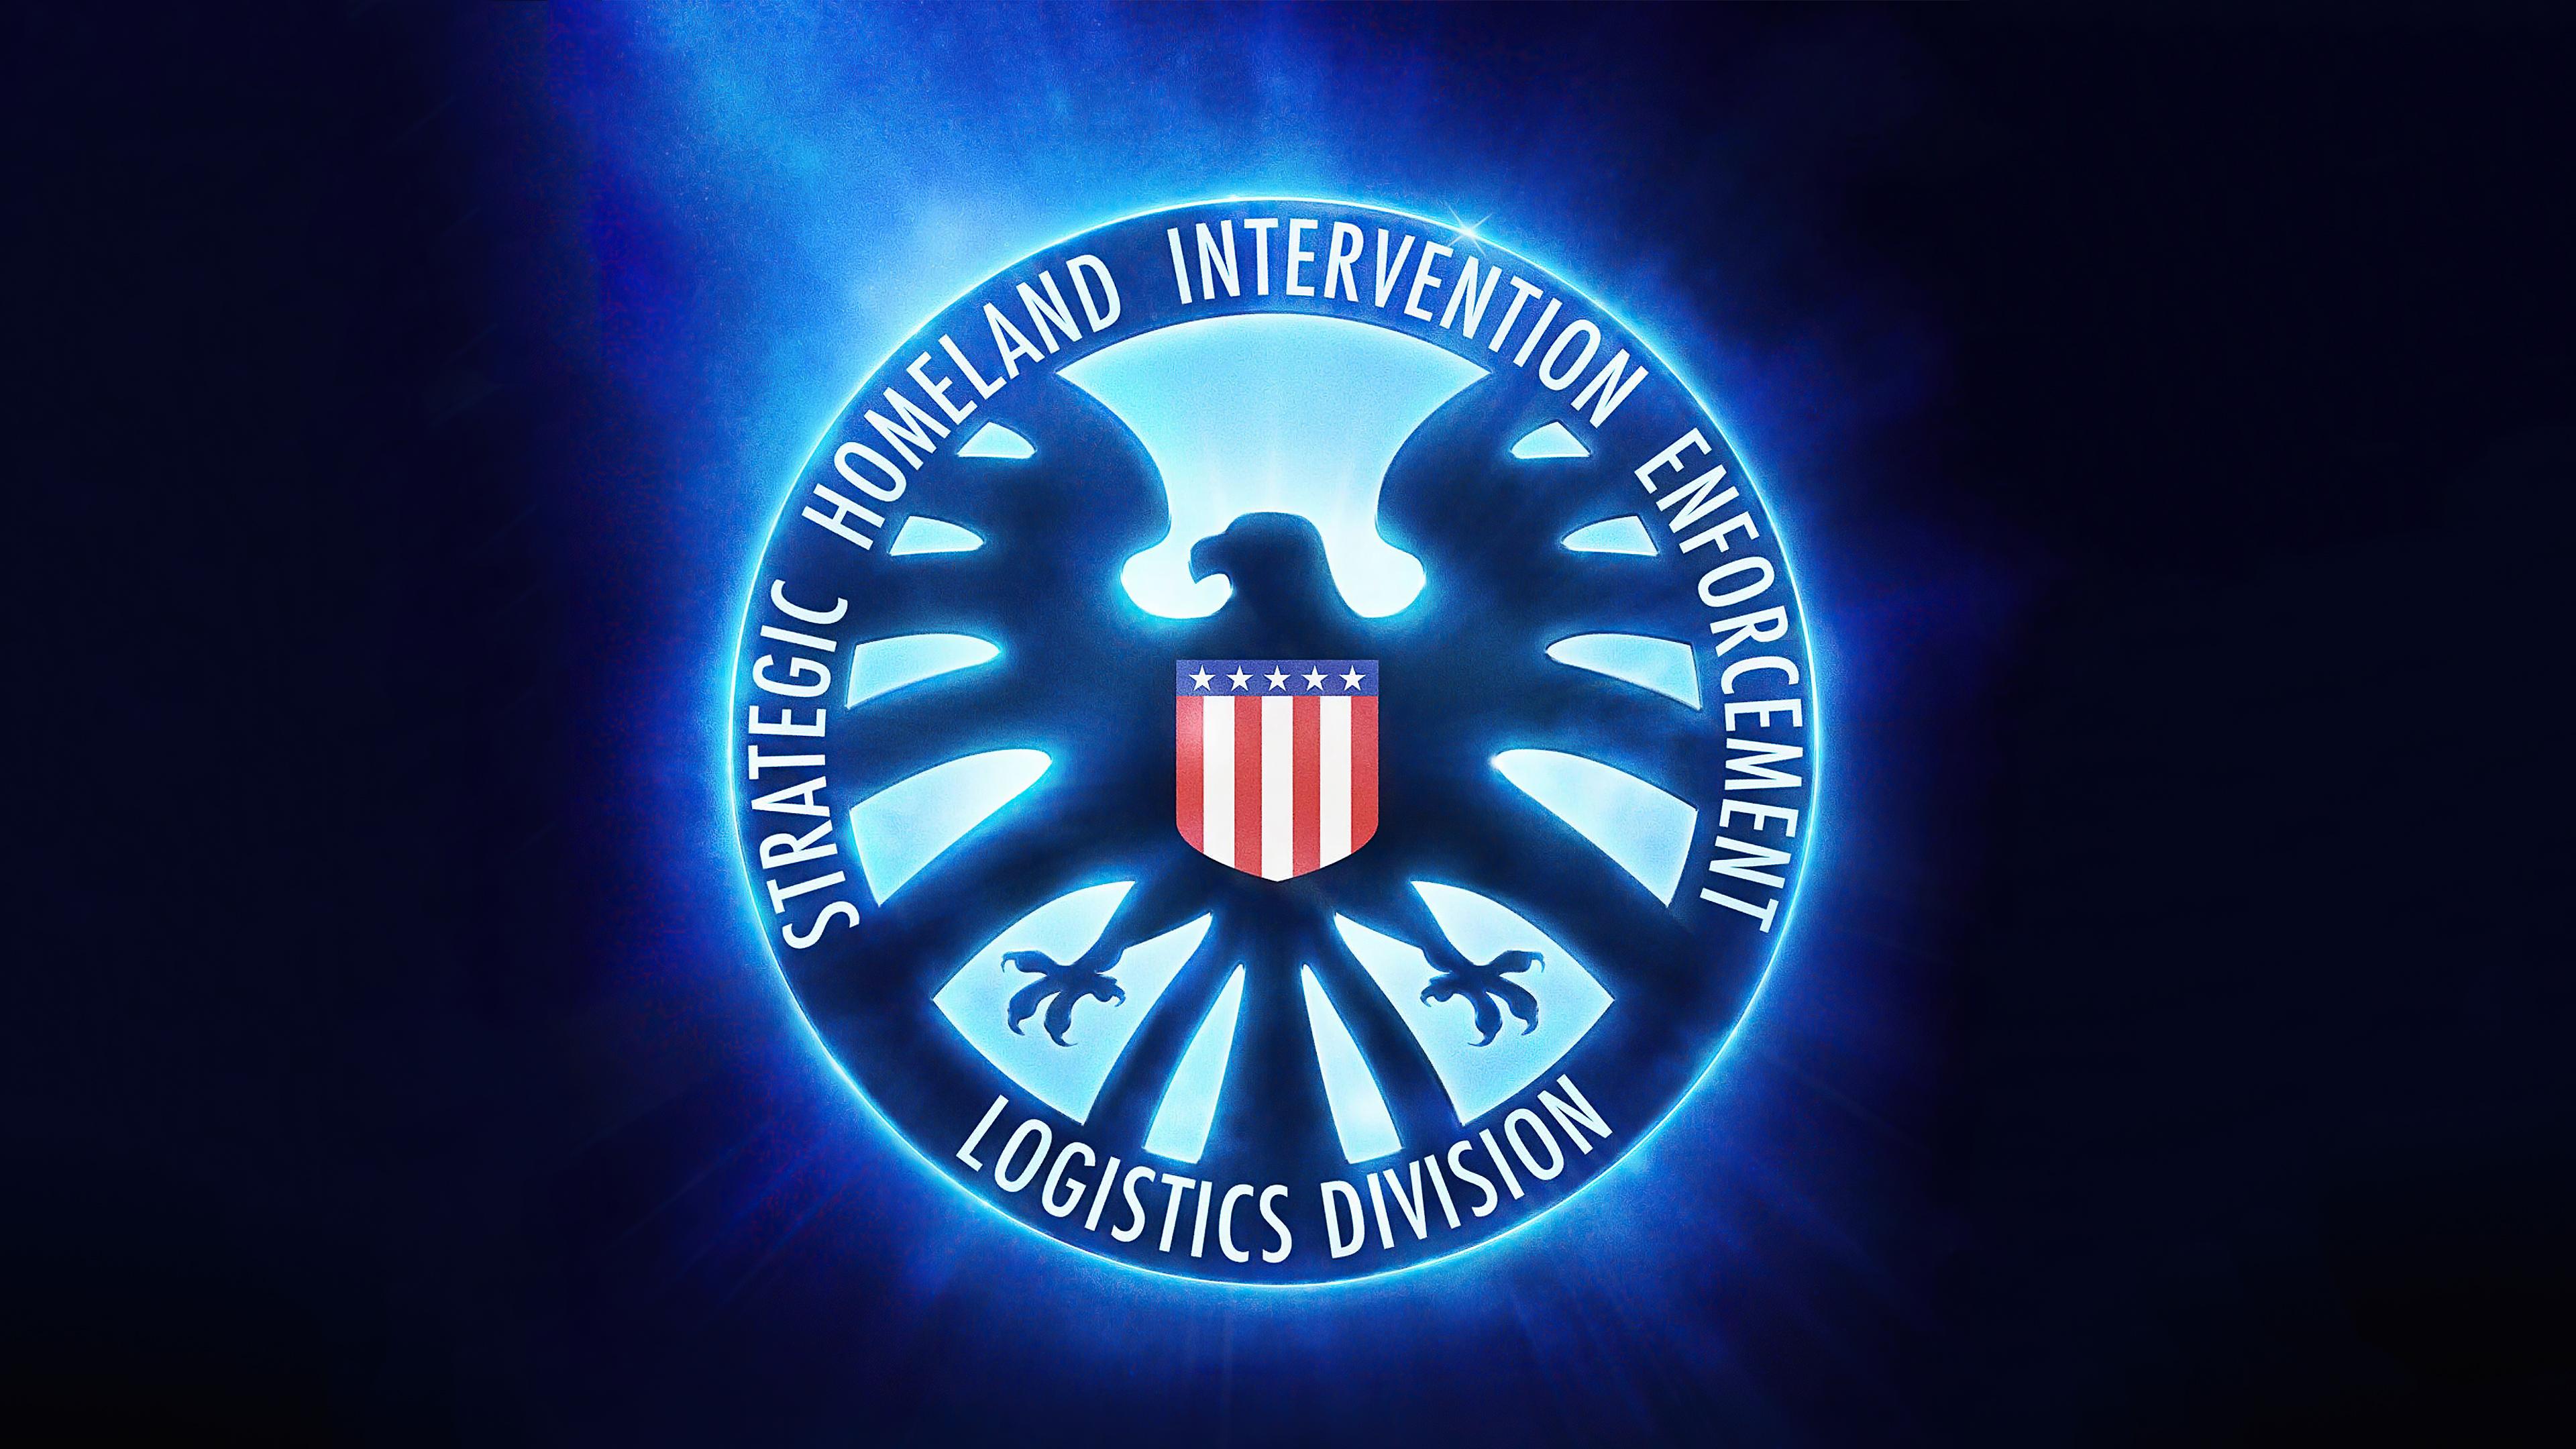 agents of shield 2020 logo 4k 1615198952 - Agents Of Shield 2020 Logo 4k - Agents Of Shield 2020 Logo 4k wallpapers